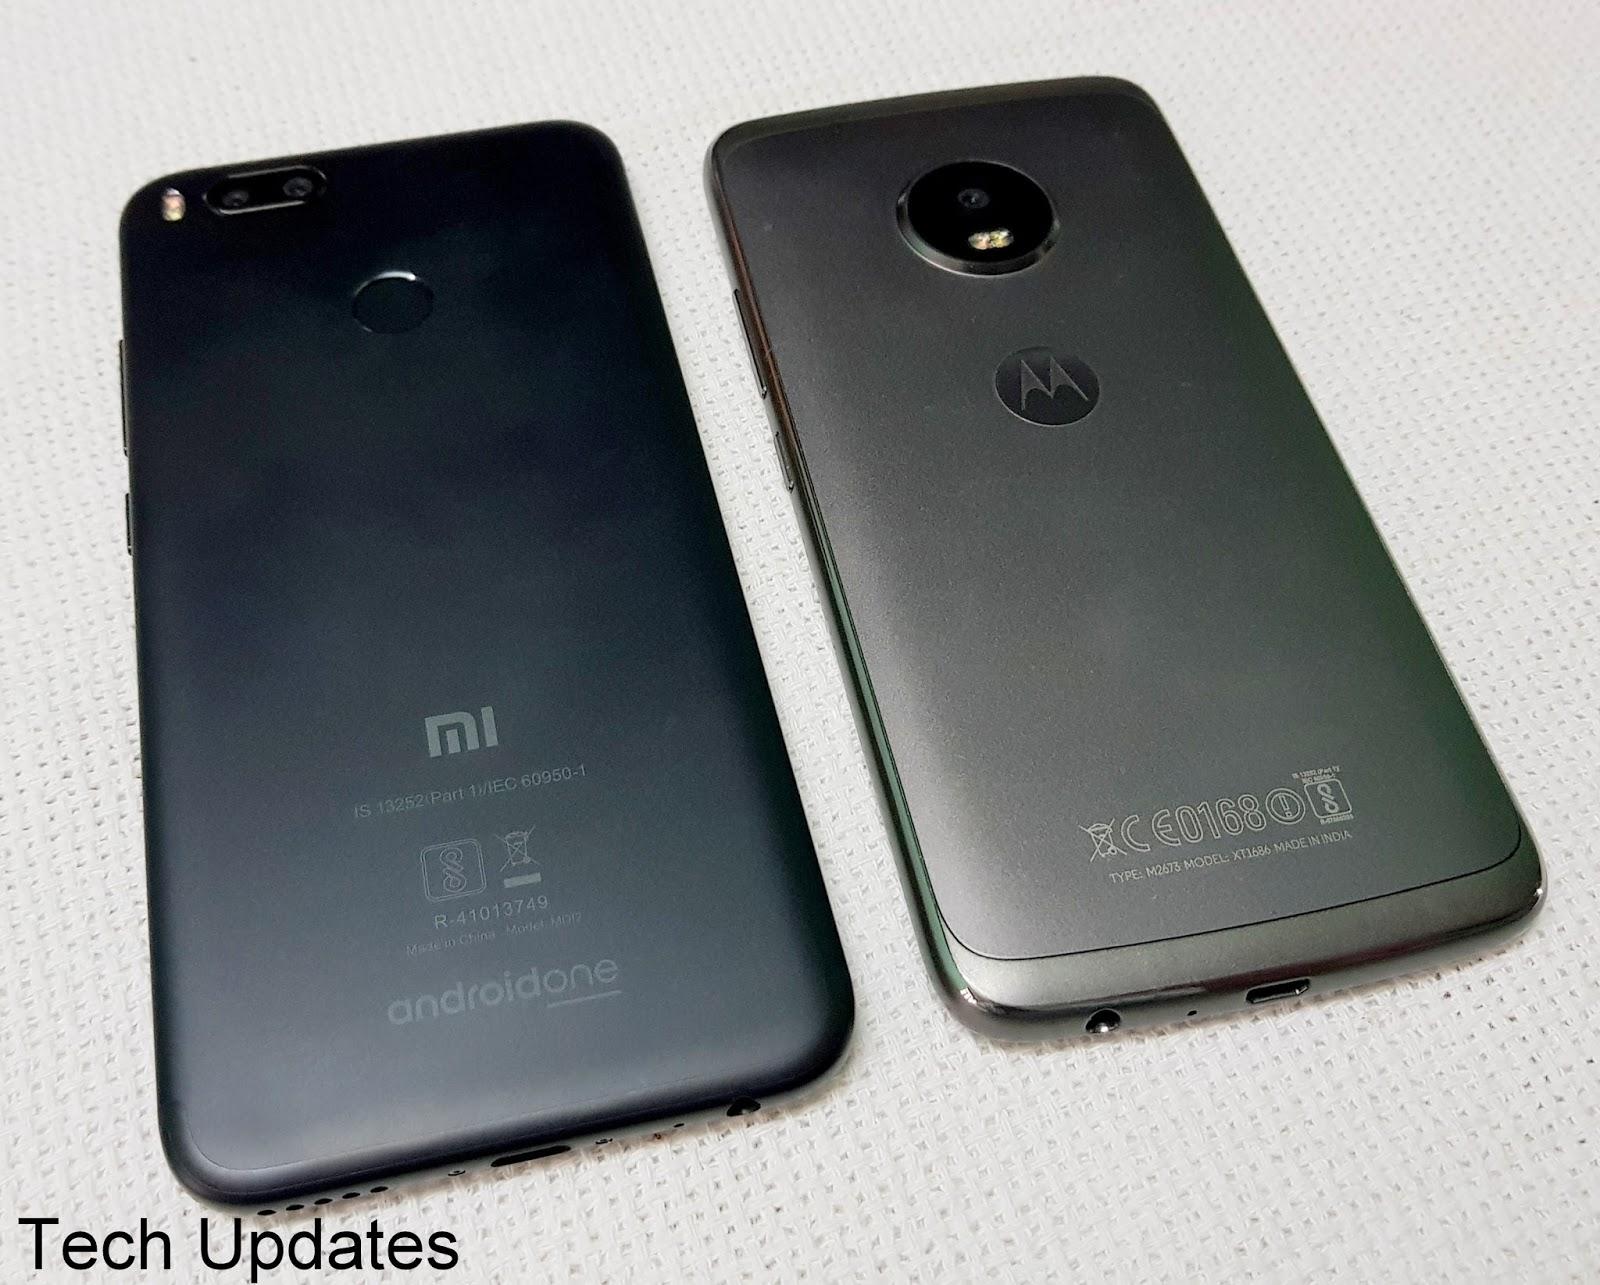 Xiaomi Mi A1 vs Moto G5 Plus Camera, Performance, Features